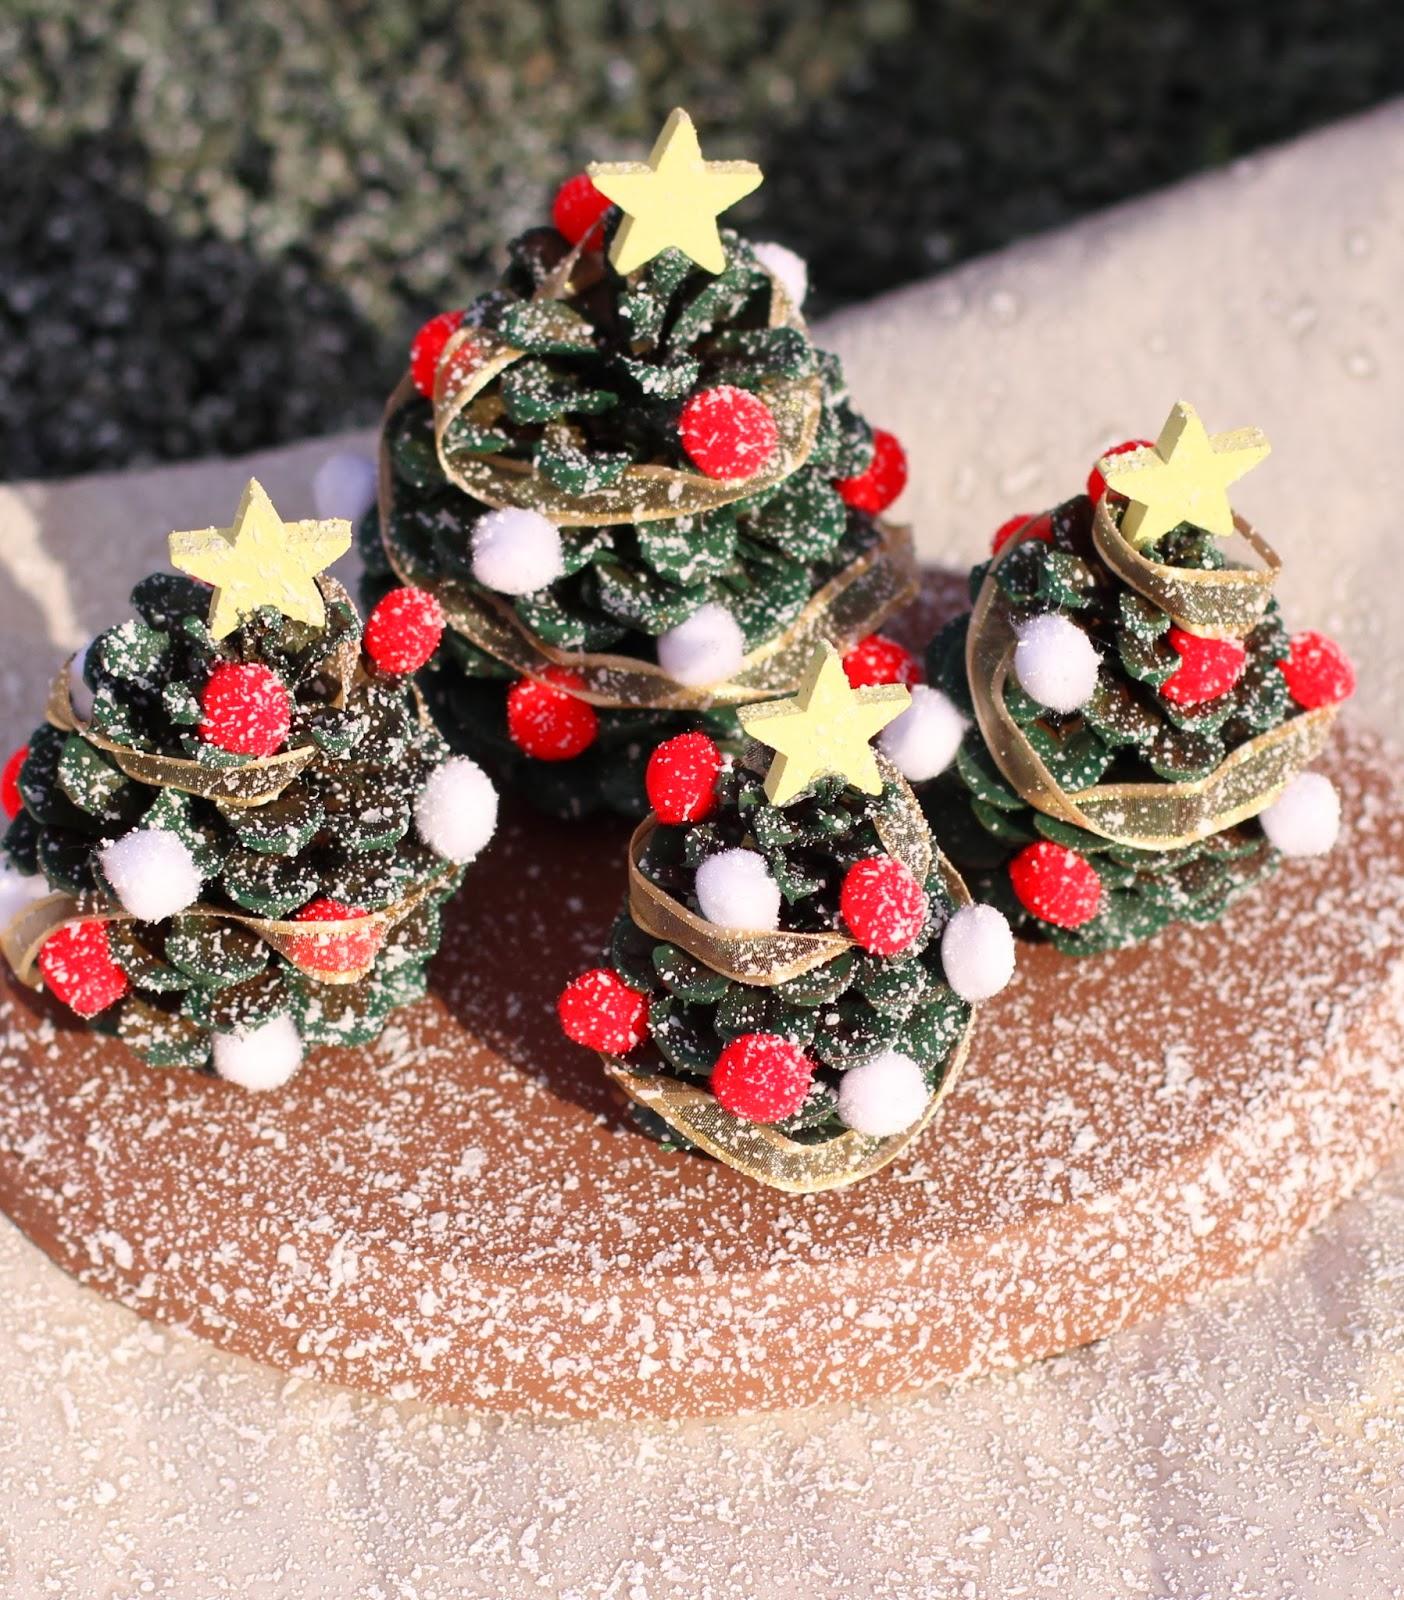 Kids' Craft: Pine Cone Christmas Tree Village Decoration